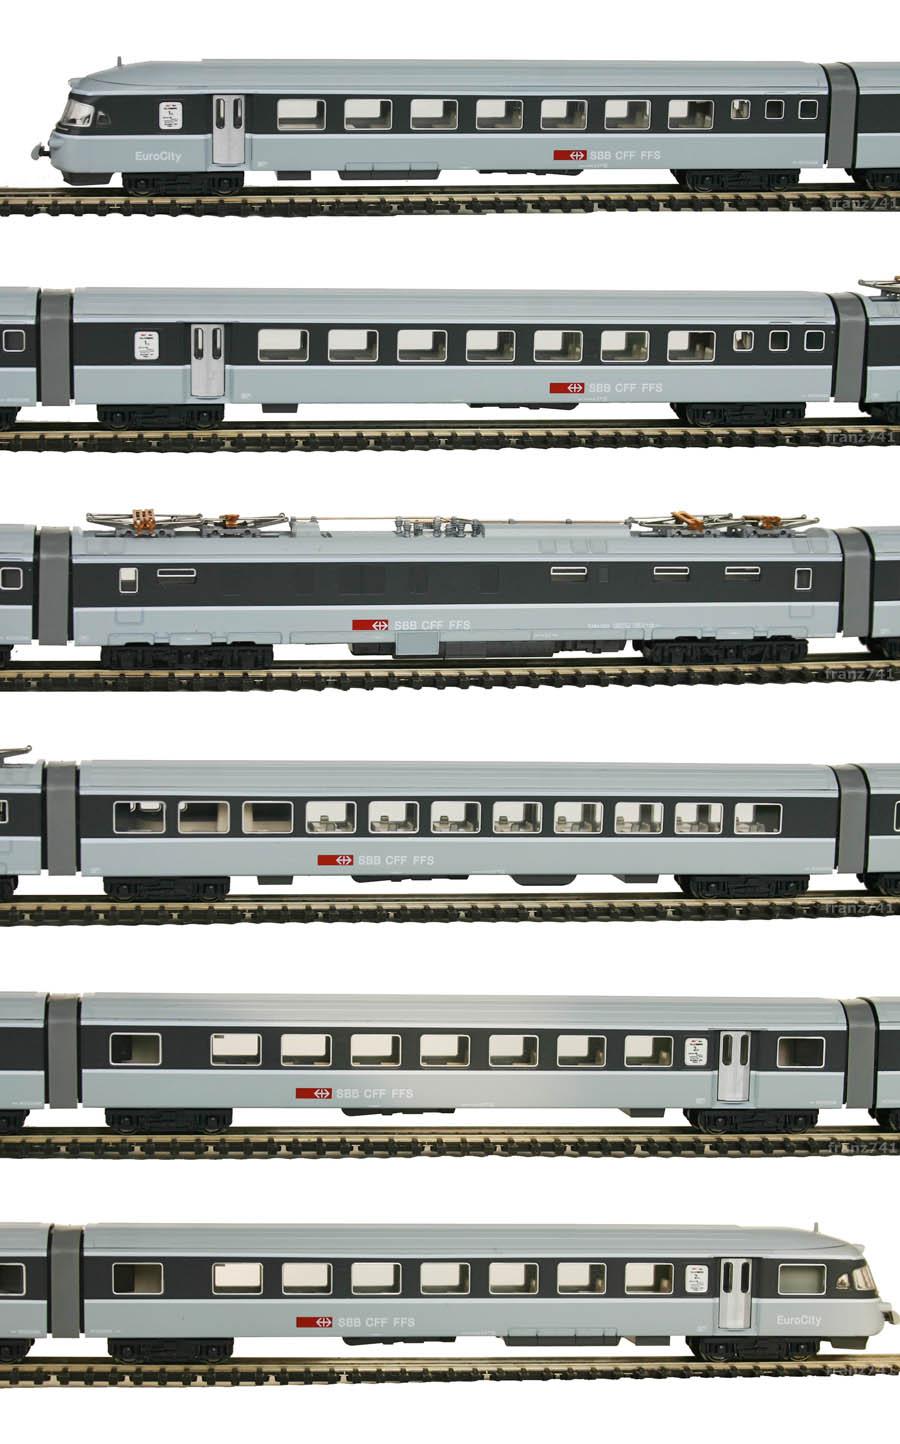 Hobbytrain-11405-RABe-1055-EC-Triebwagenzug-Graue-Maus-SBB